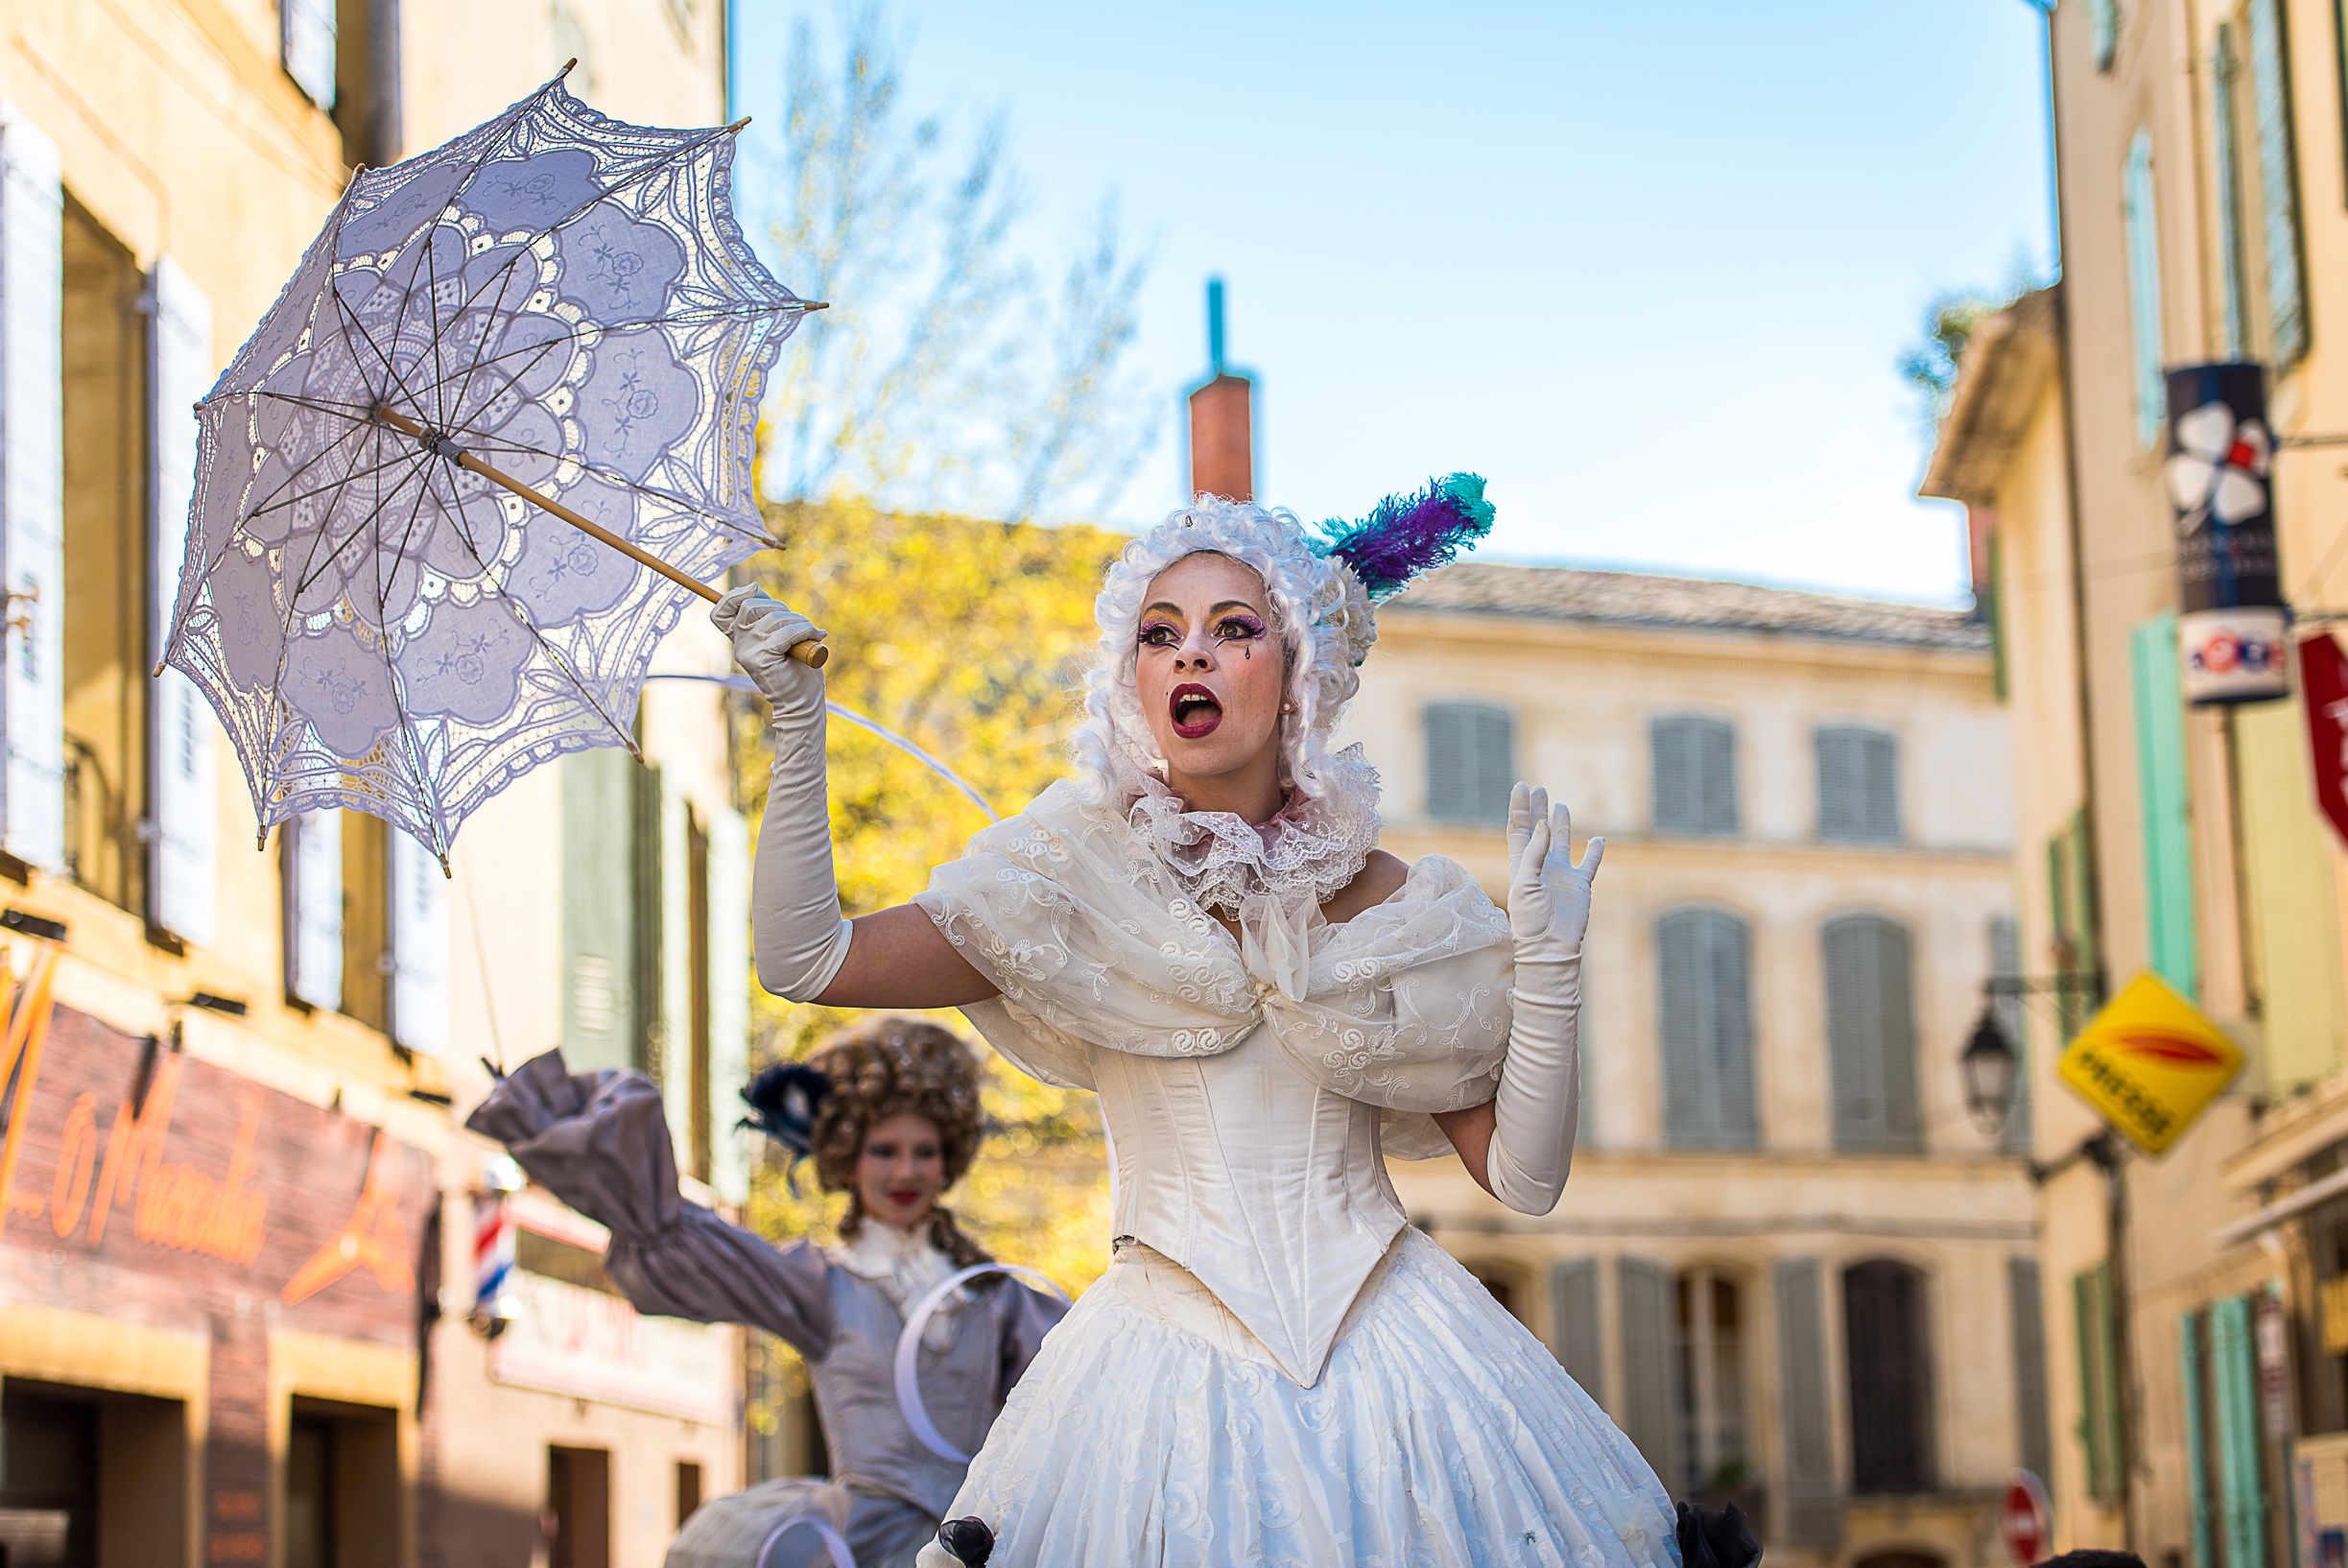 echassier-carnaval-marquise-baroque-chant-lyrique-sur-echases